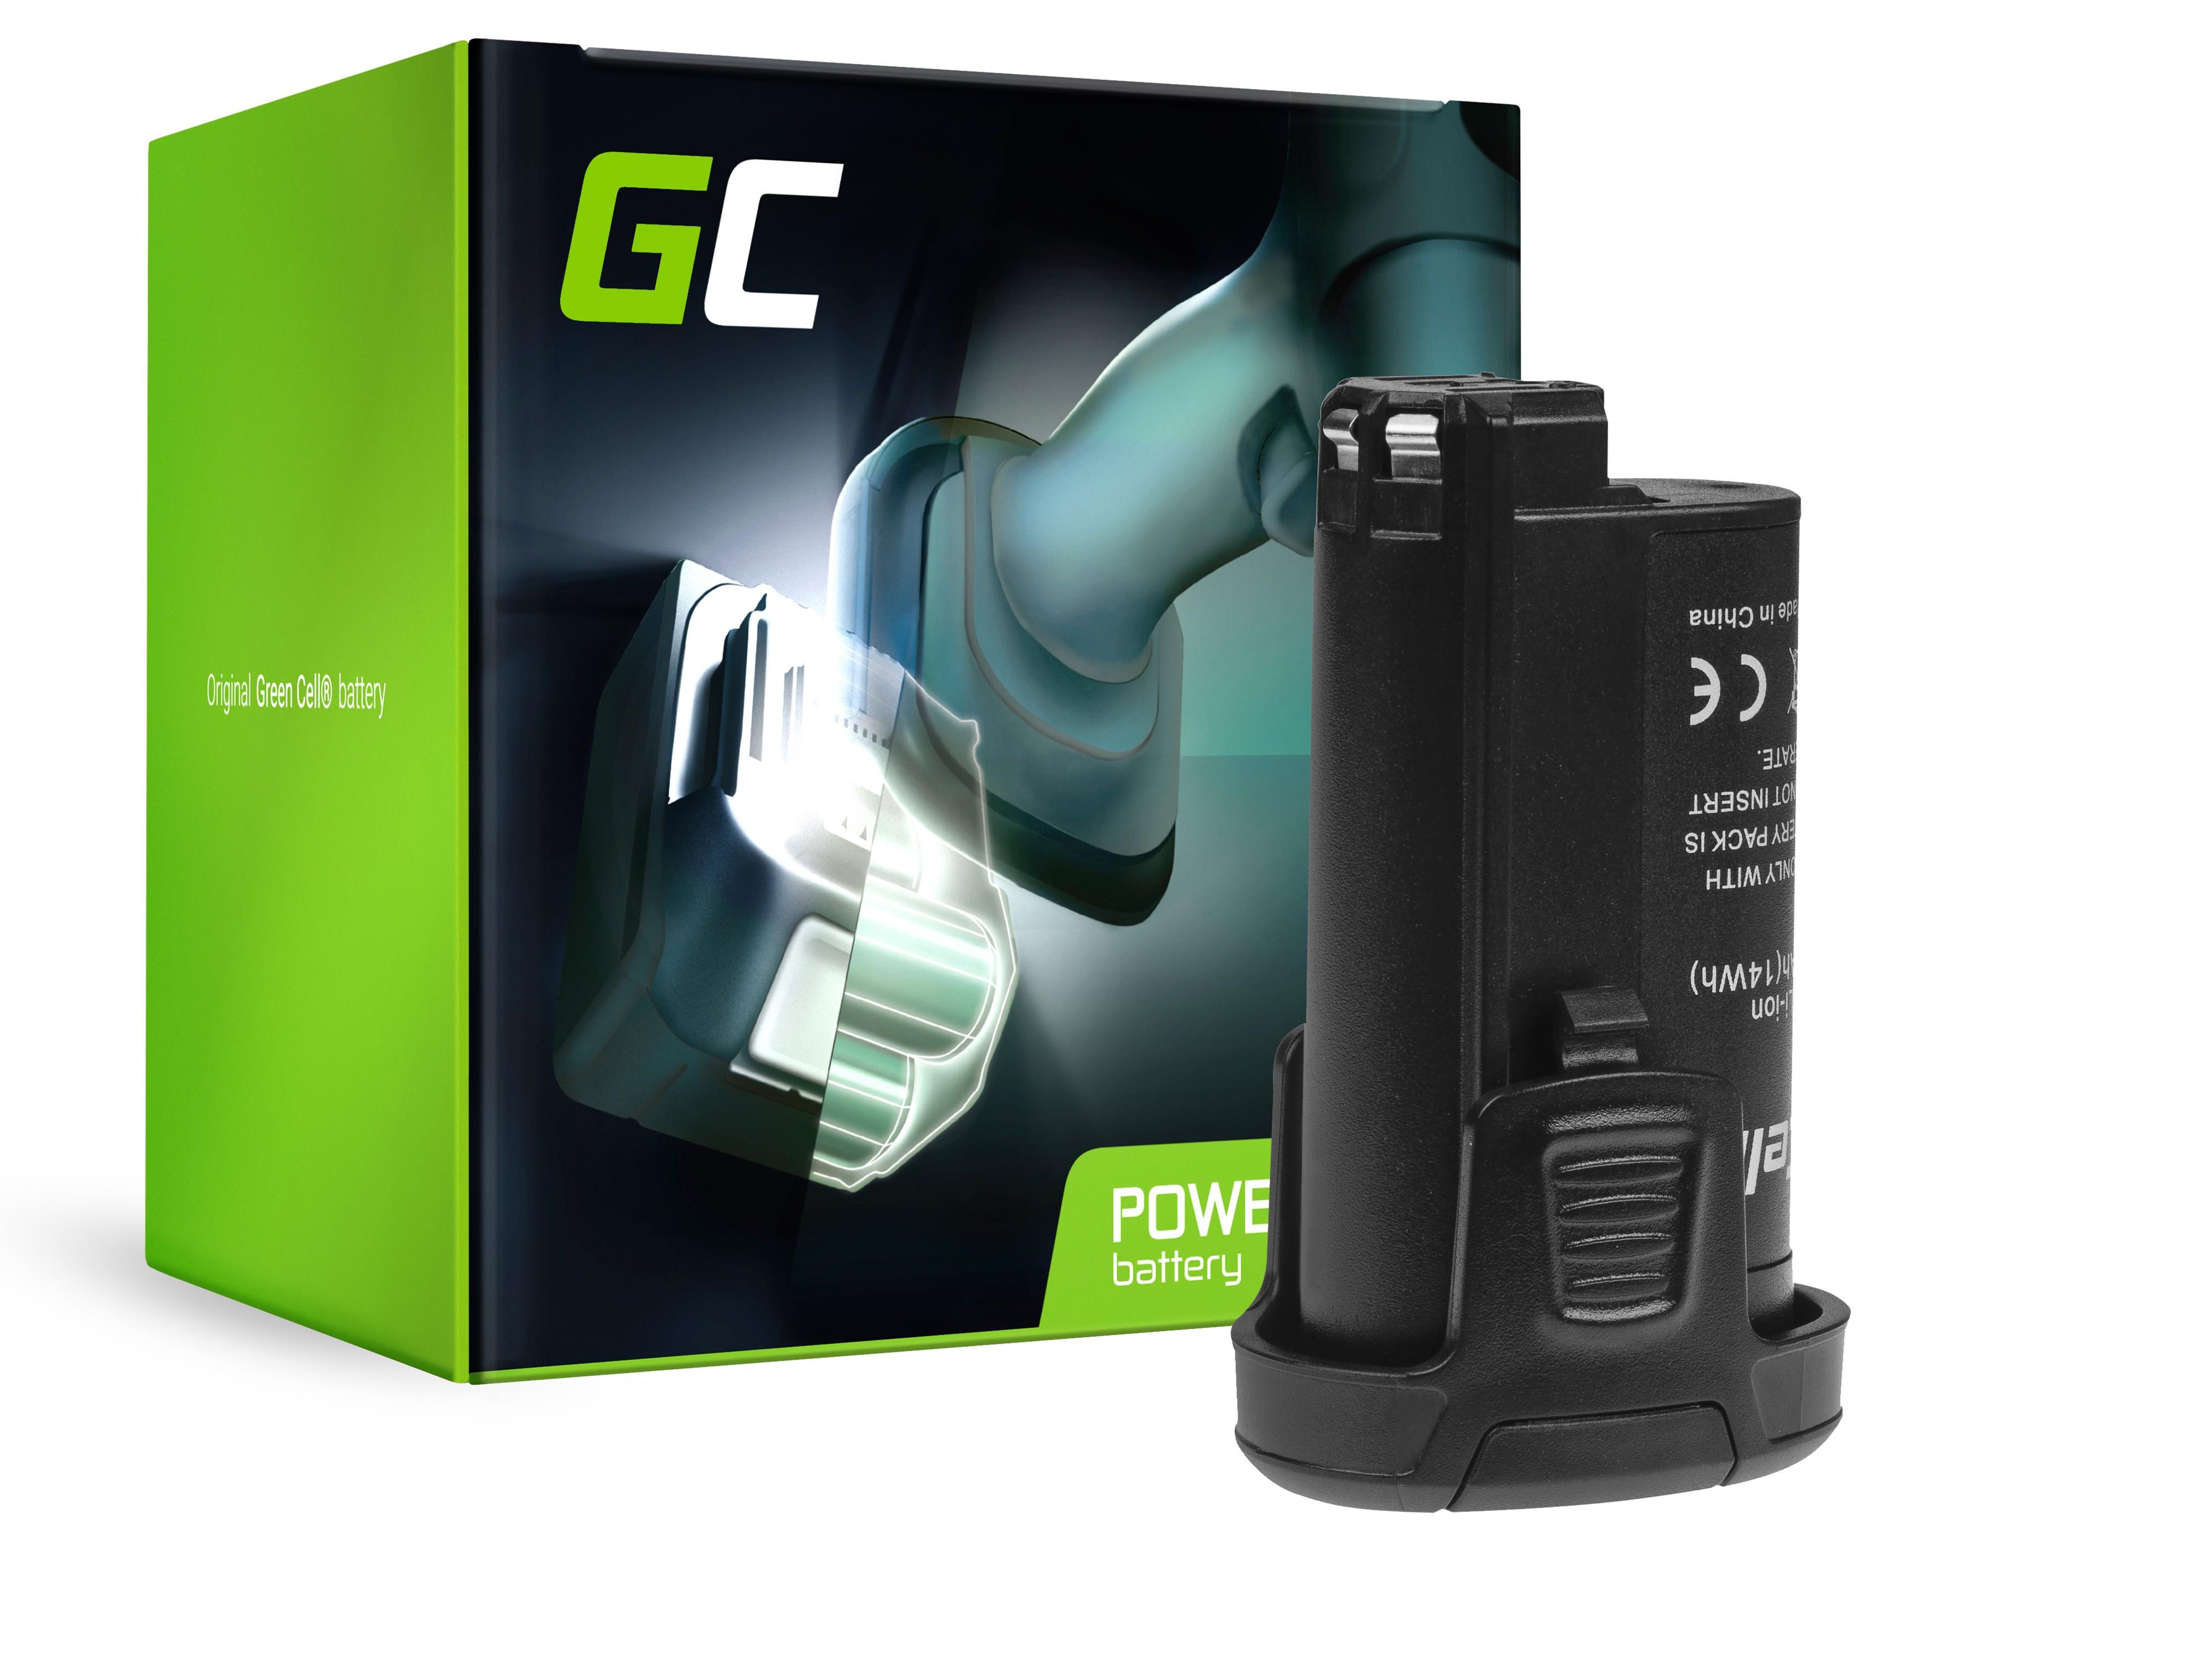 Batteri Akumulator 2 607 336 715 2.615.080.8JA do Dremel 8100 85-0352 B808-01 Sladdlös Multi-Tool